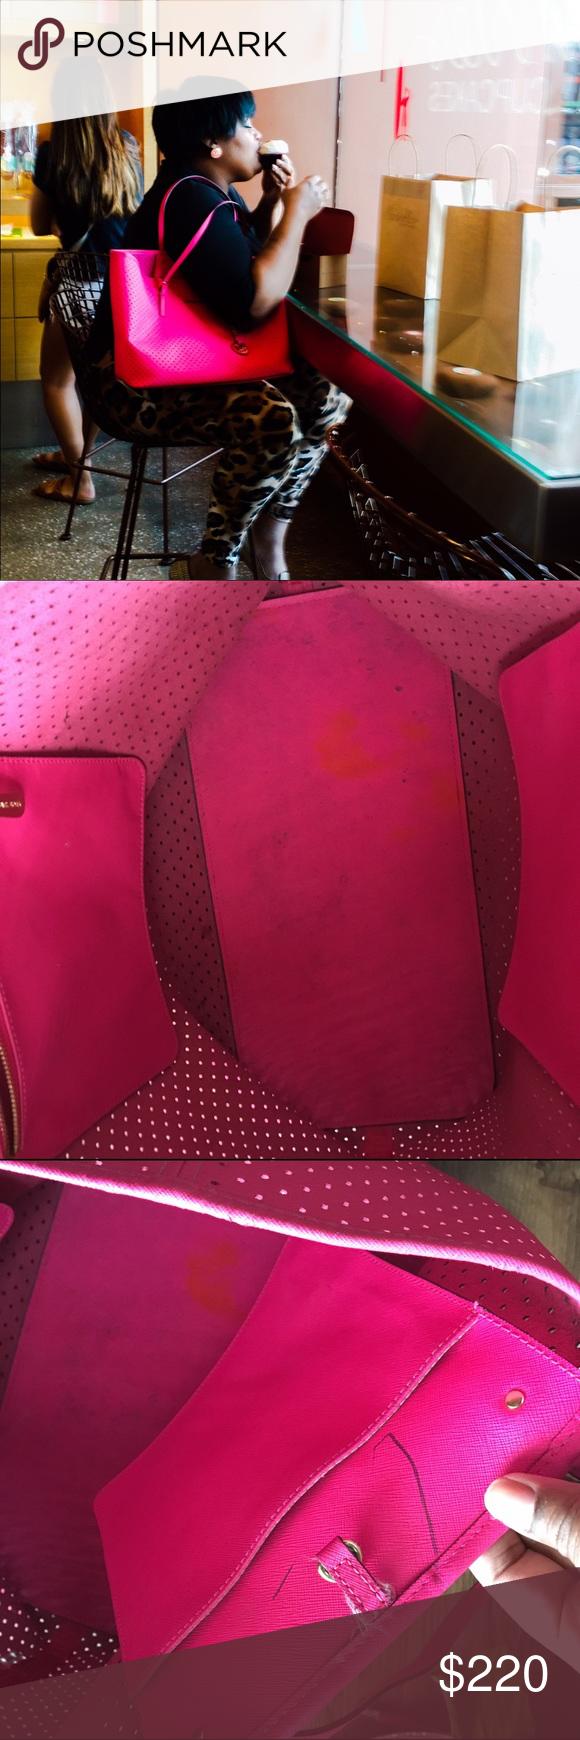 7c7b2807f6c5 PRELOVED Michael Kors Large Bag ⚔️PRICE FIRM⚔